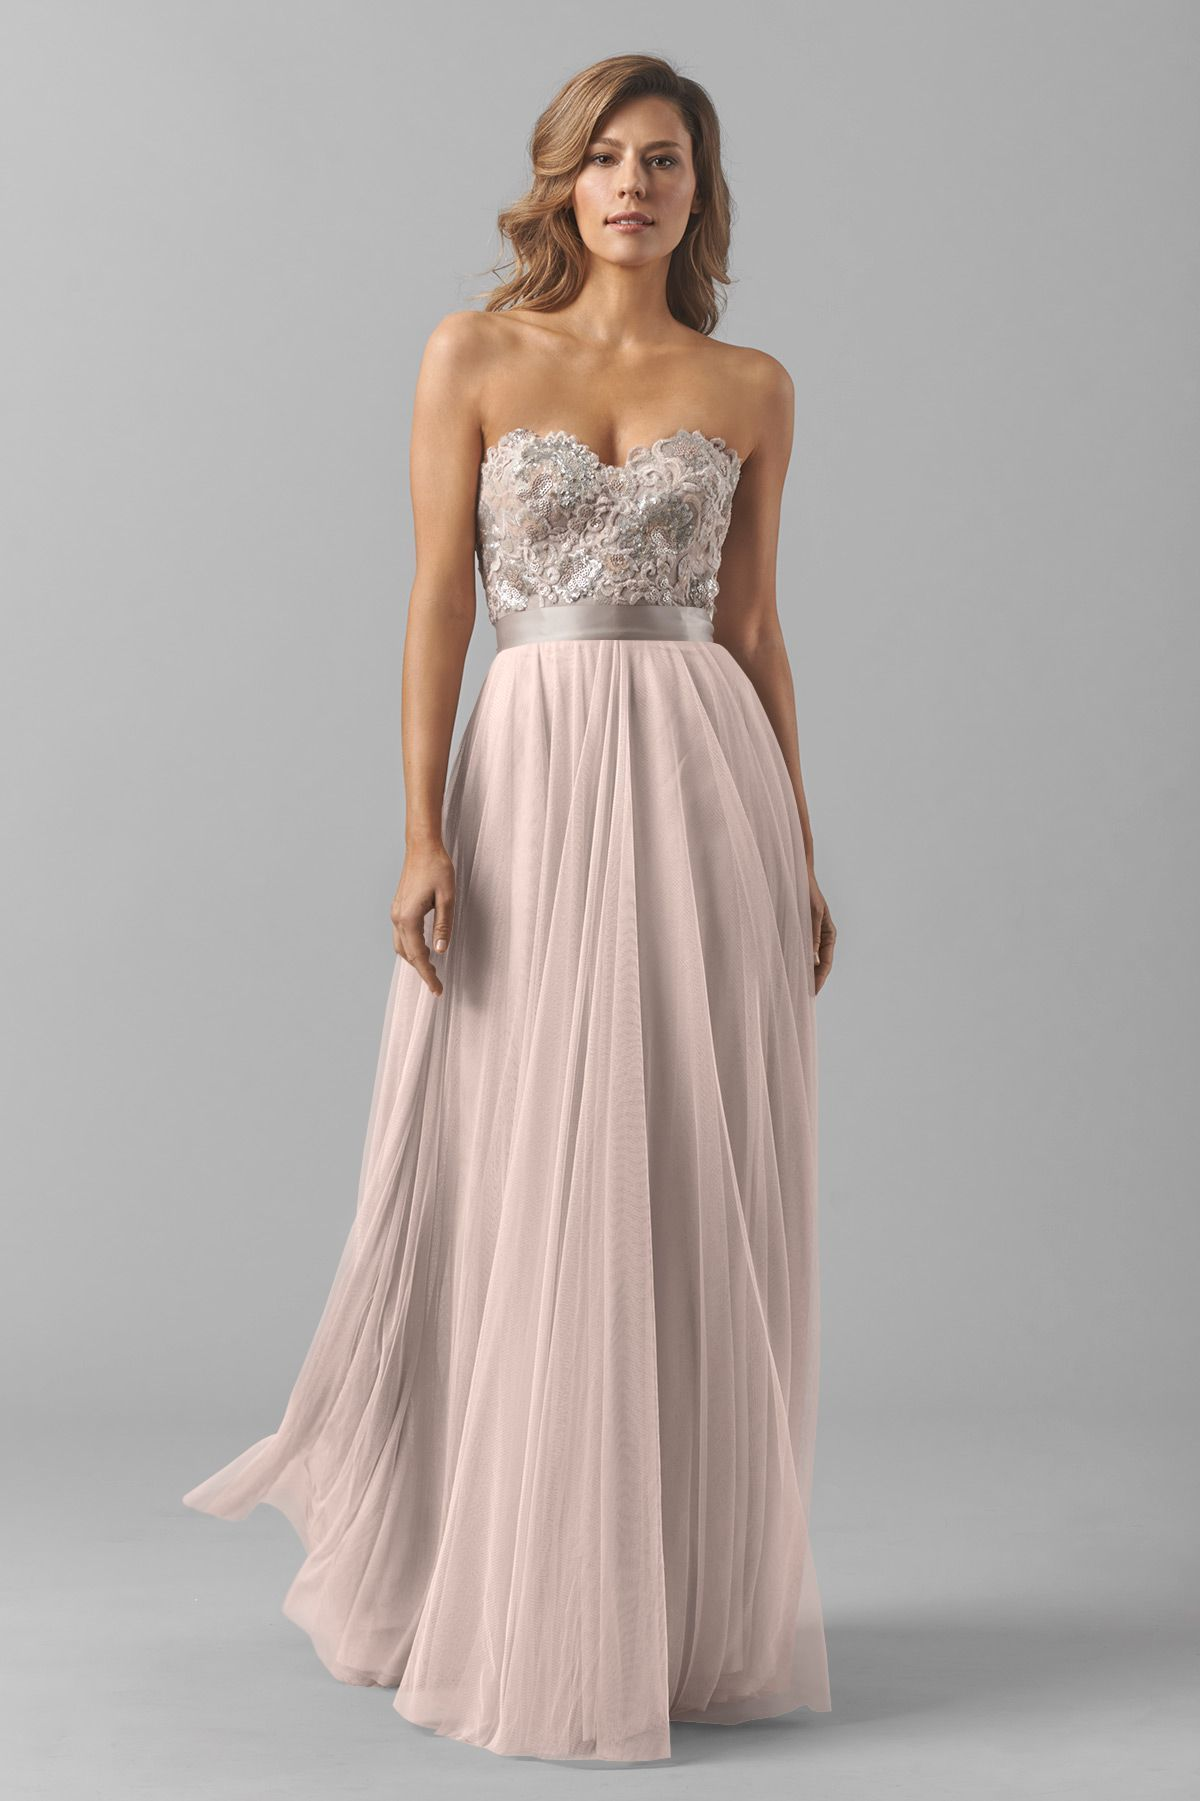 Watters Maids Dress Brescia   bridesmaid dresses   Pinterest